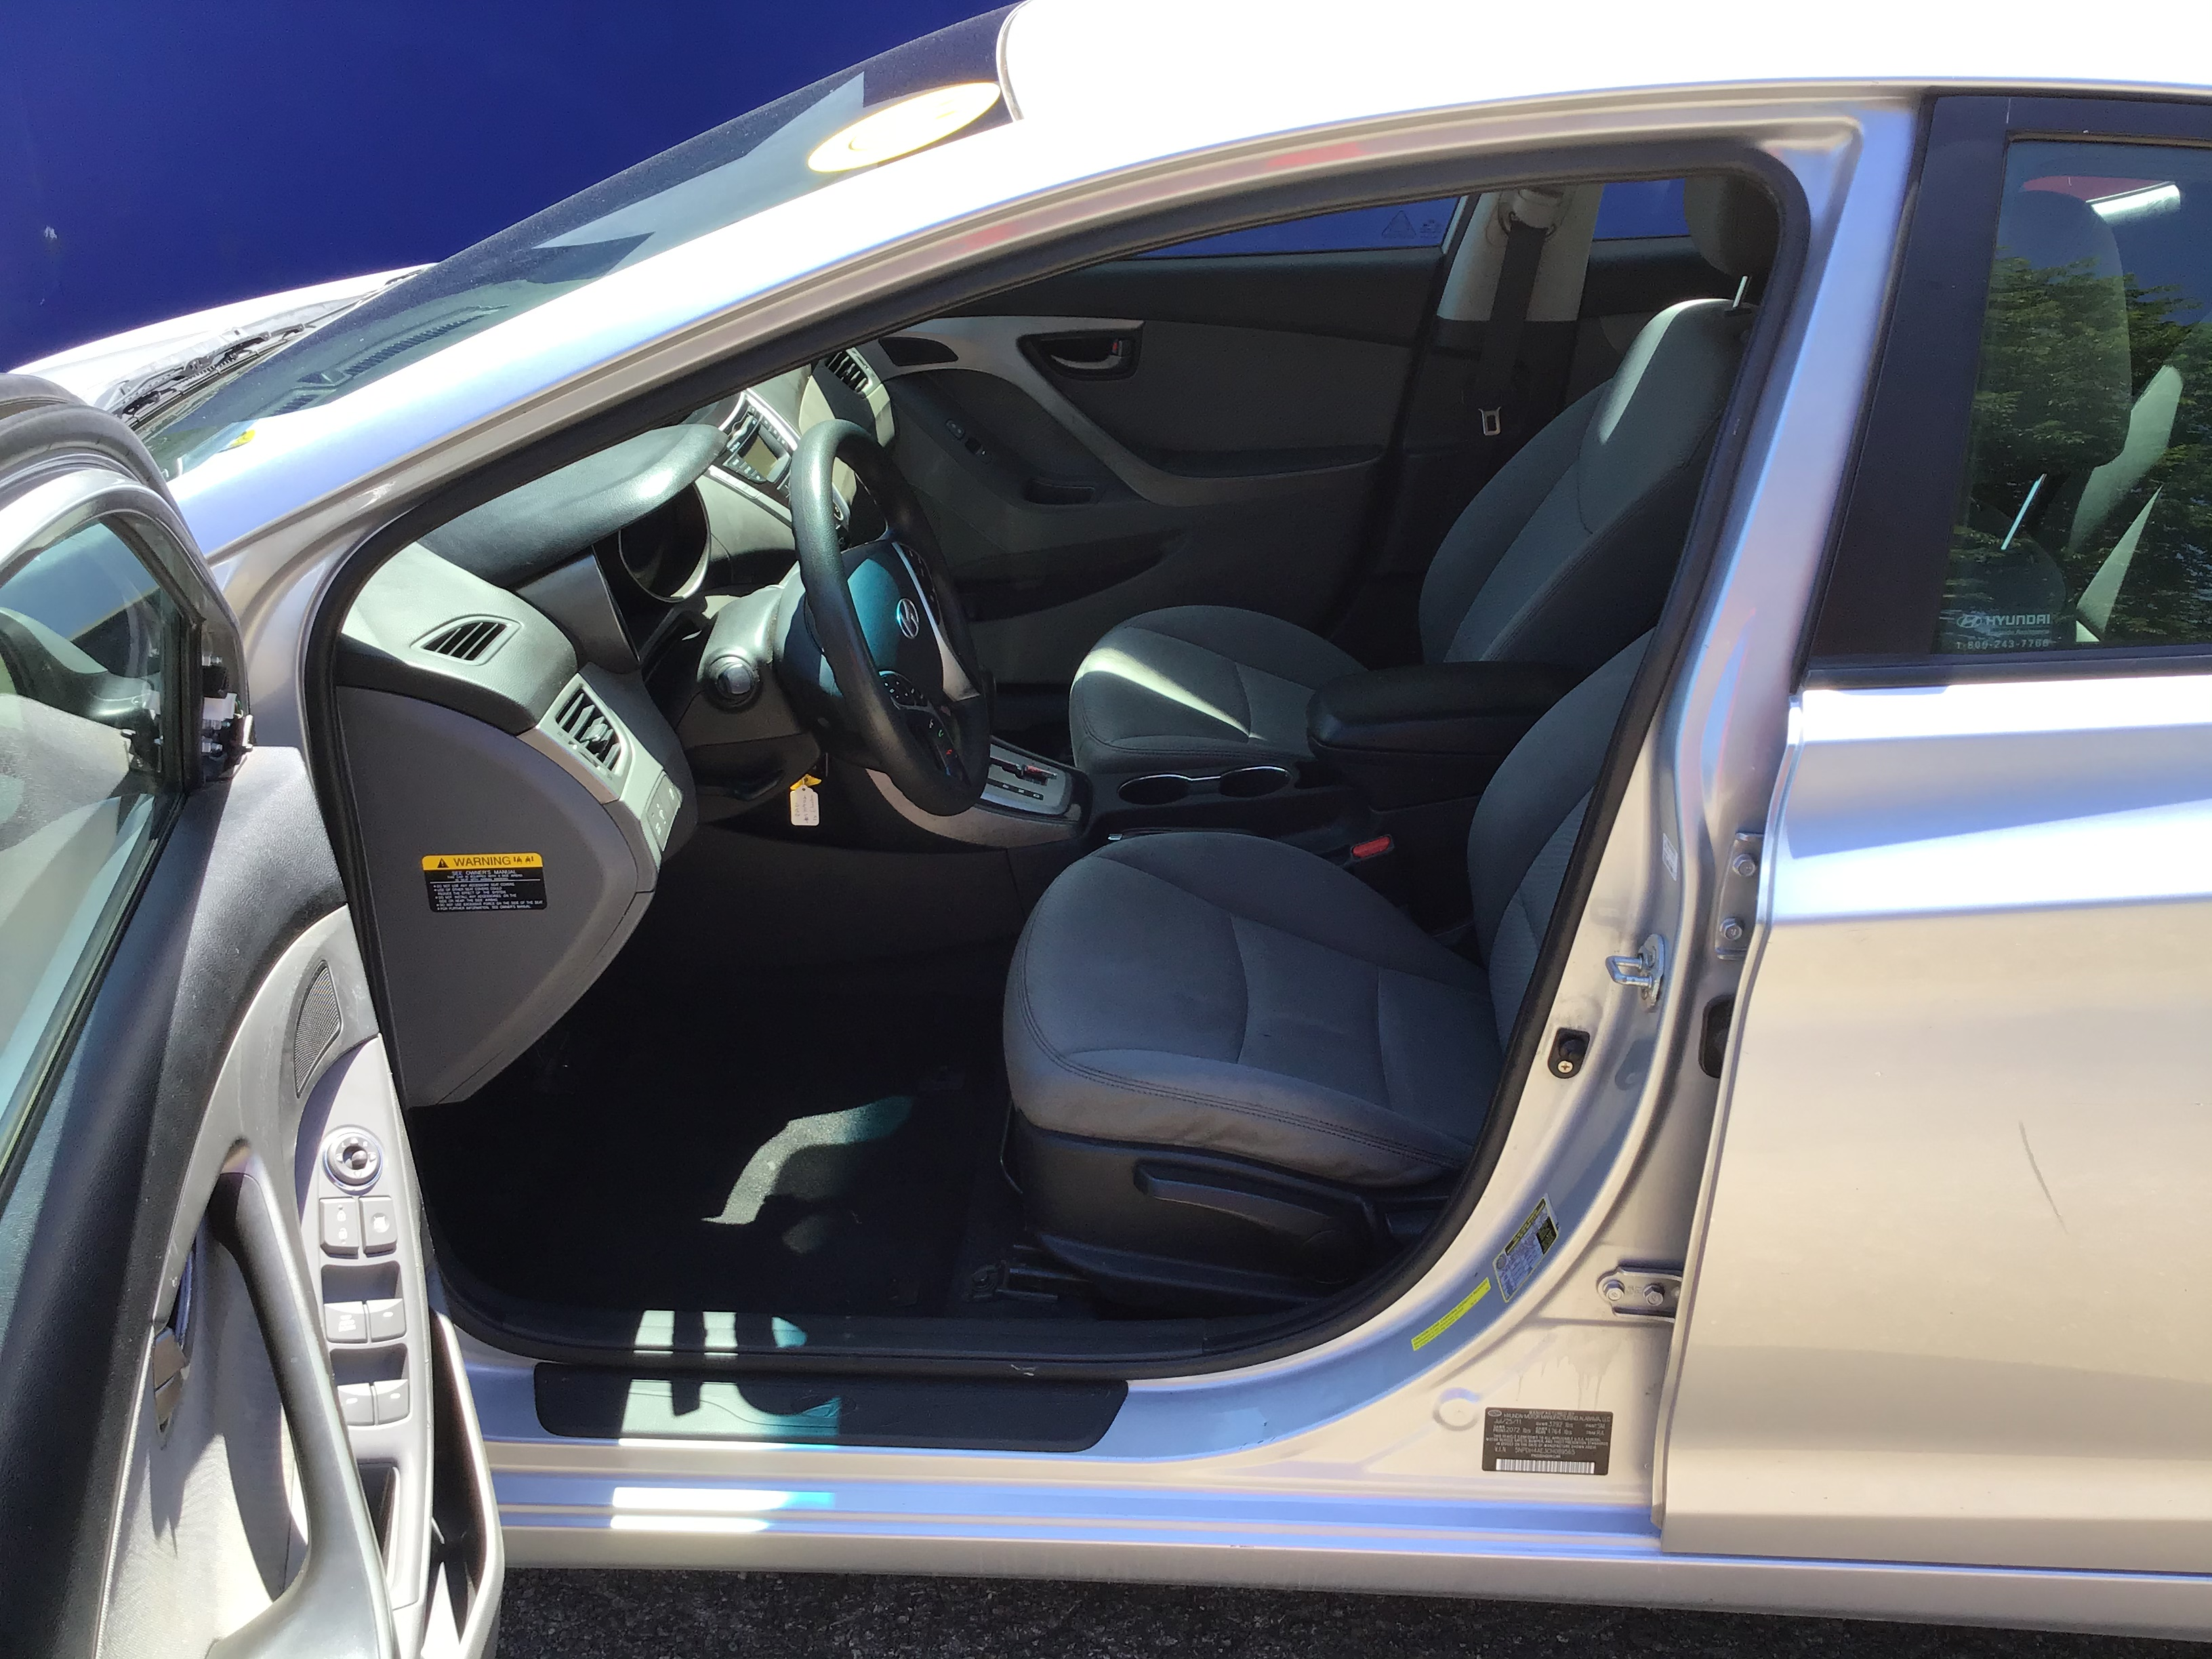 used vehicle - Sedan HYUNDAI ELANTRA 2012